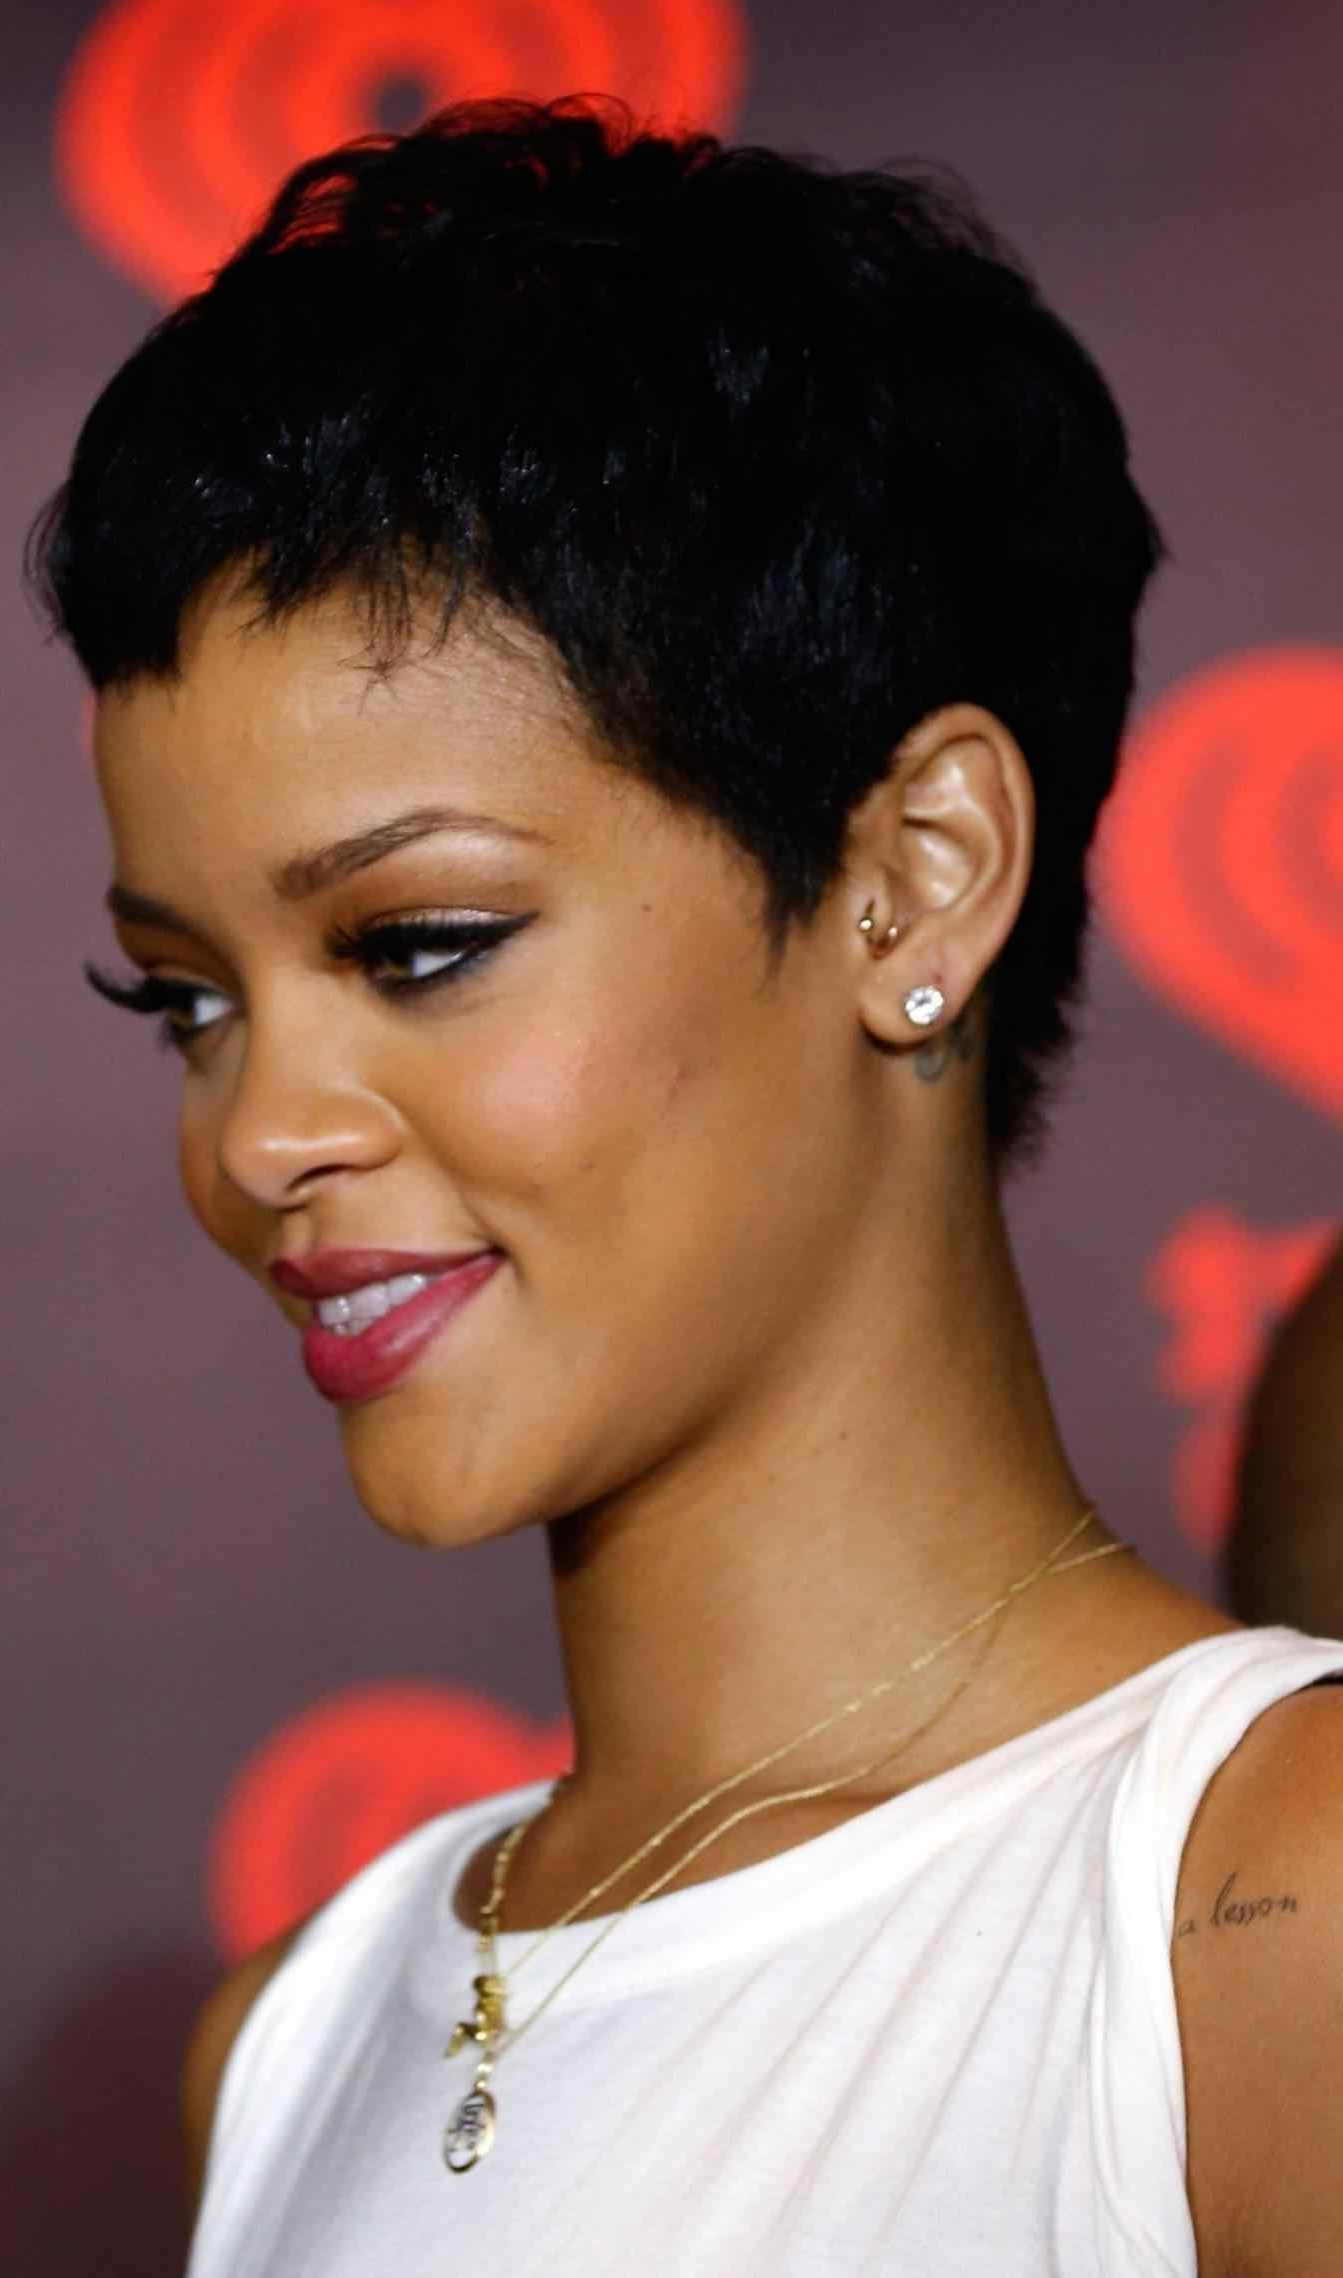 Brand New Short Hairstyles For Black Women With Oval Faces – Fresh With Short Haircuts For Black Women With Oval Faces (View 4 of 25)